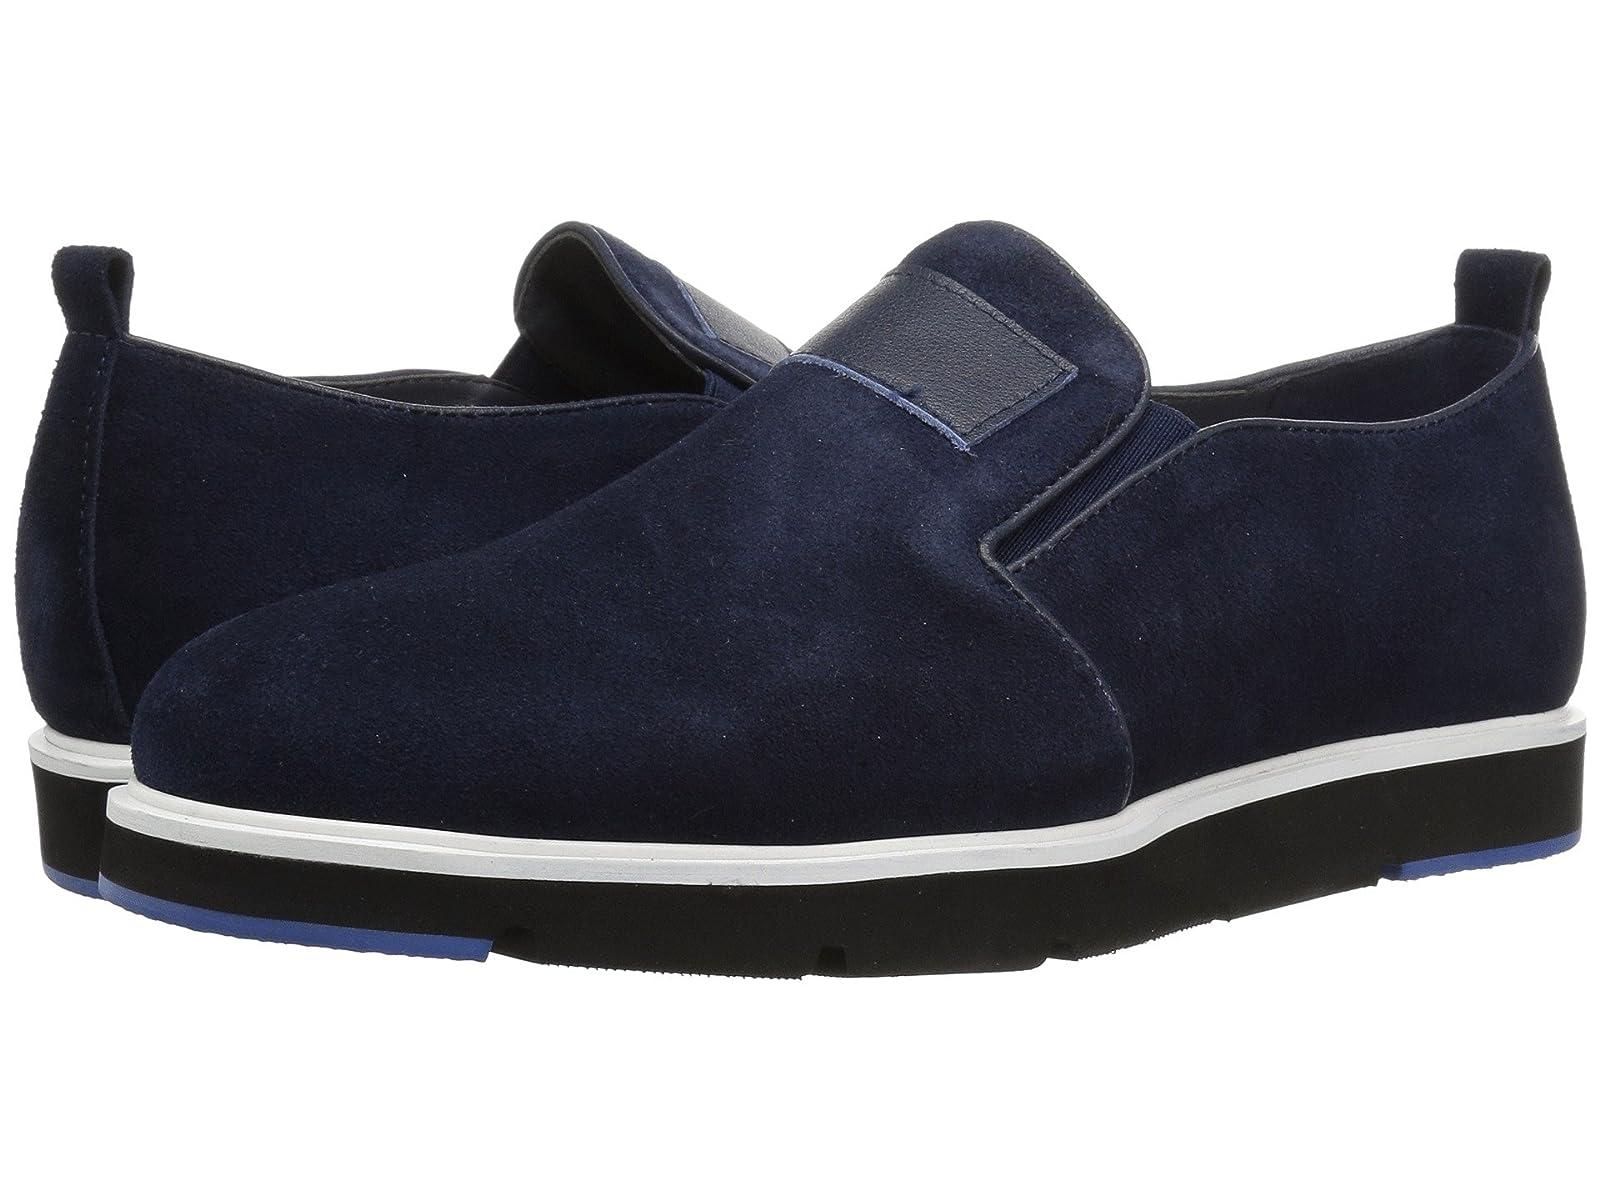 English Laundry VeronaCheap and distinctive eye-catching shoes